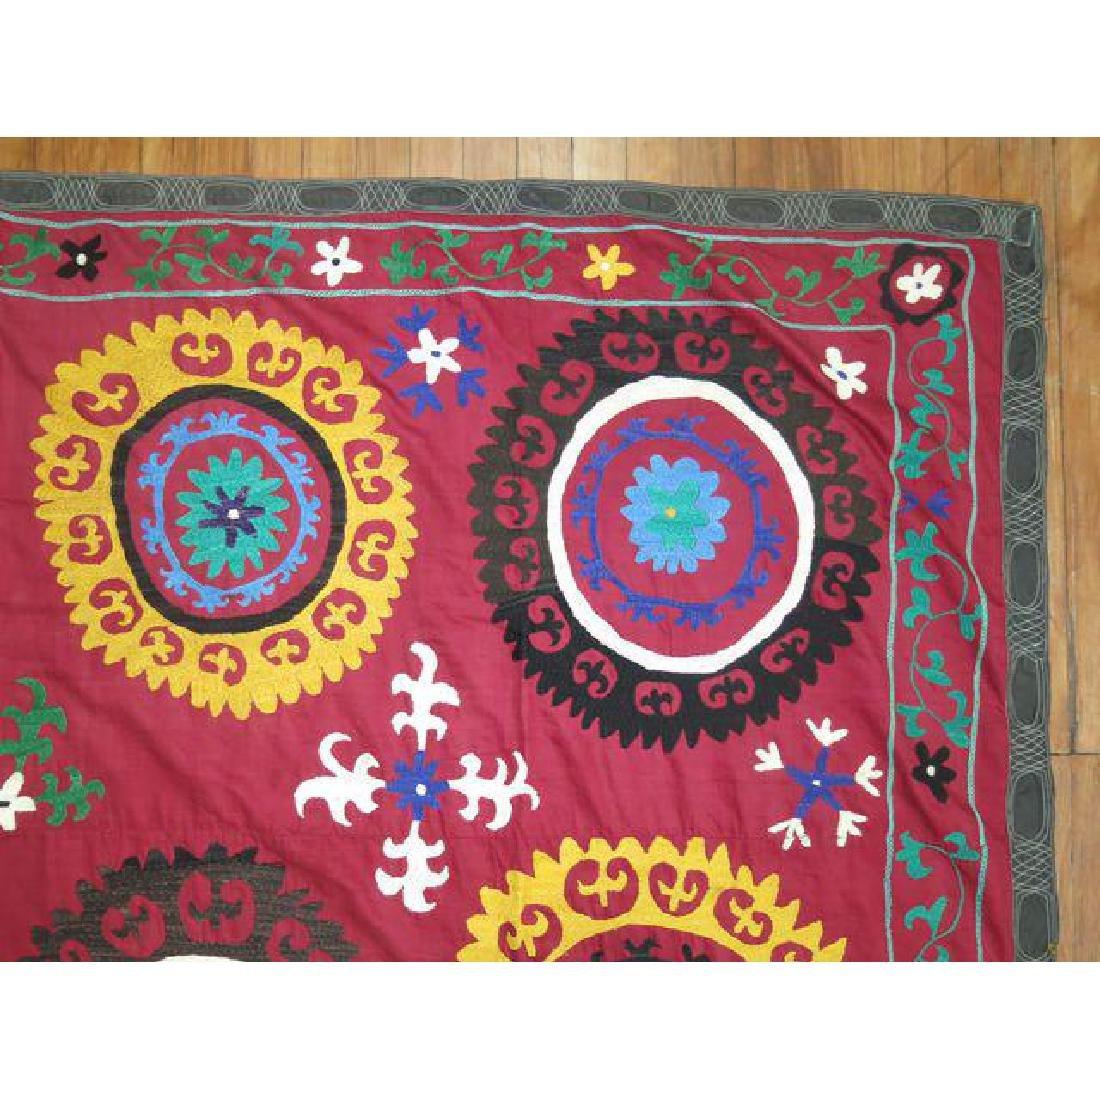 Vintage Suzanni Embroidery Throw 6.10x7.5 - 6